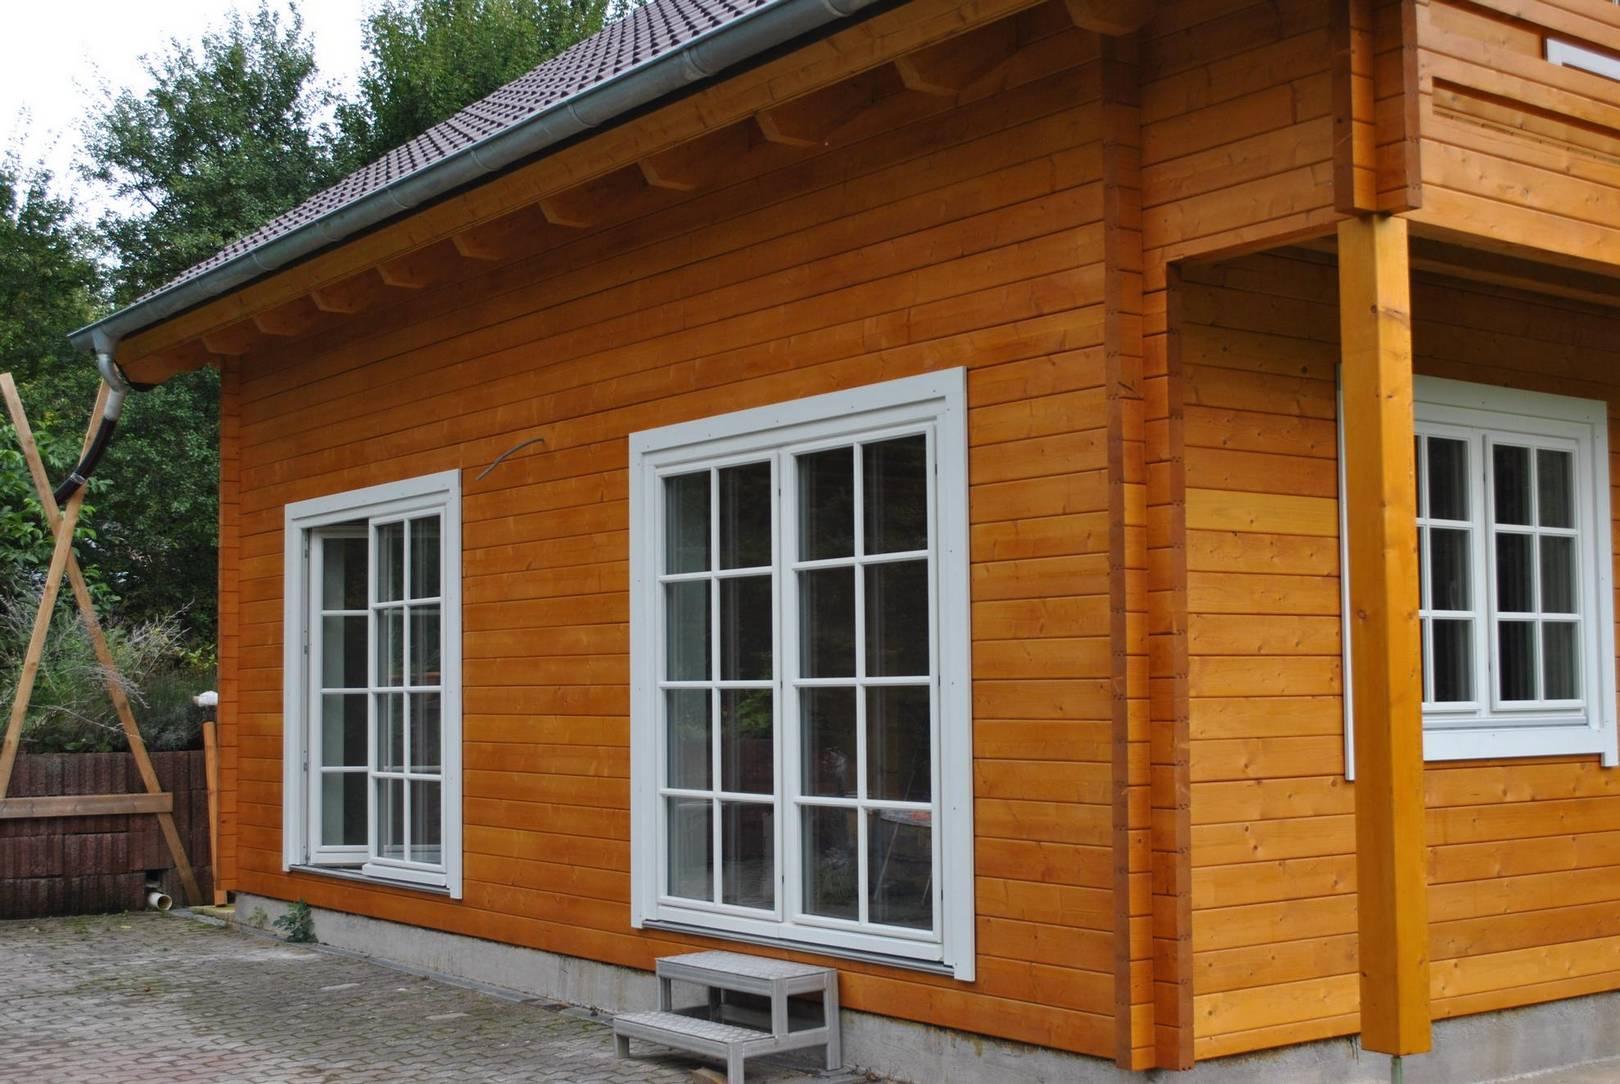 Holzhaus mikael holzrahmenbau for Modernes holzhaus bauen